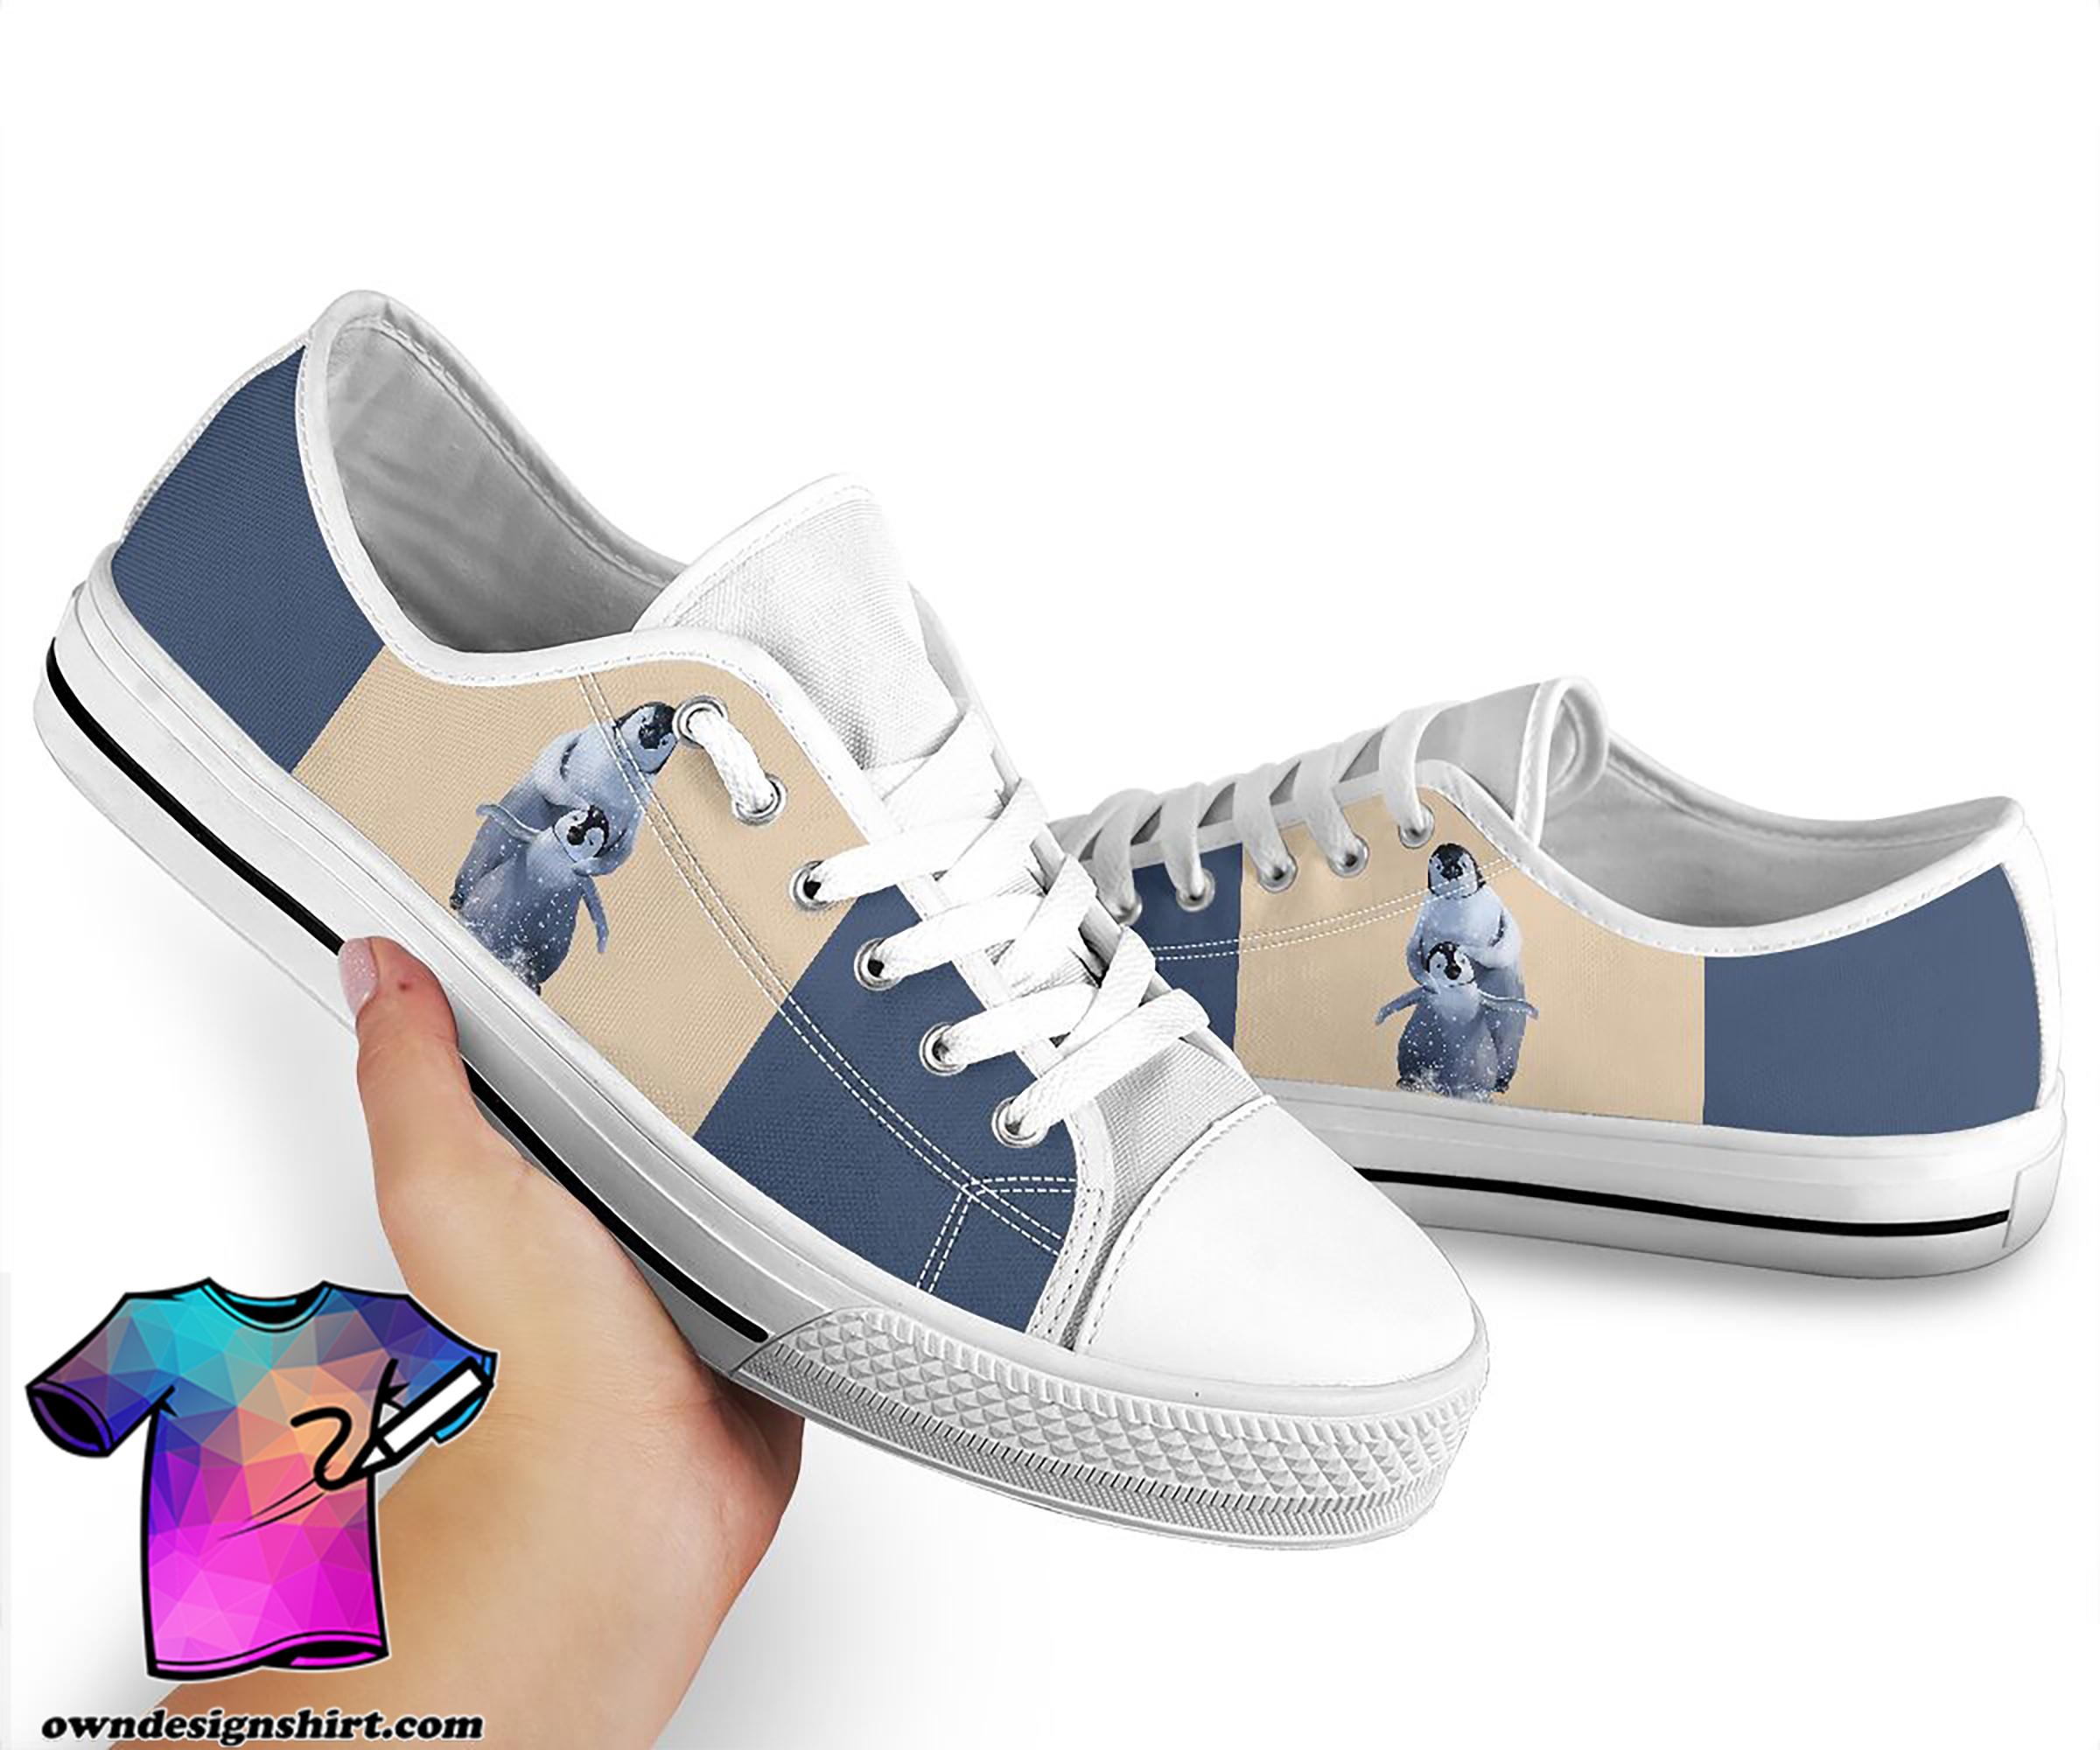 Penguin low top canvas sneakers